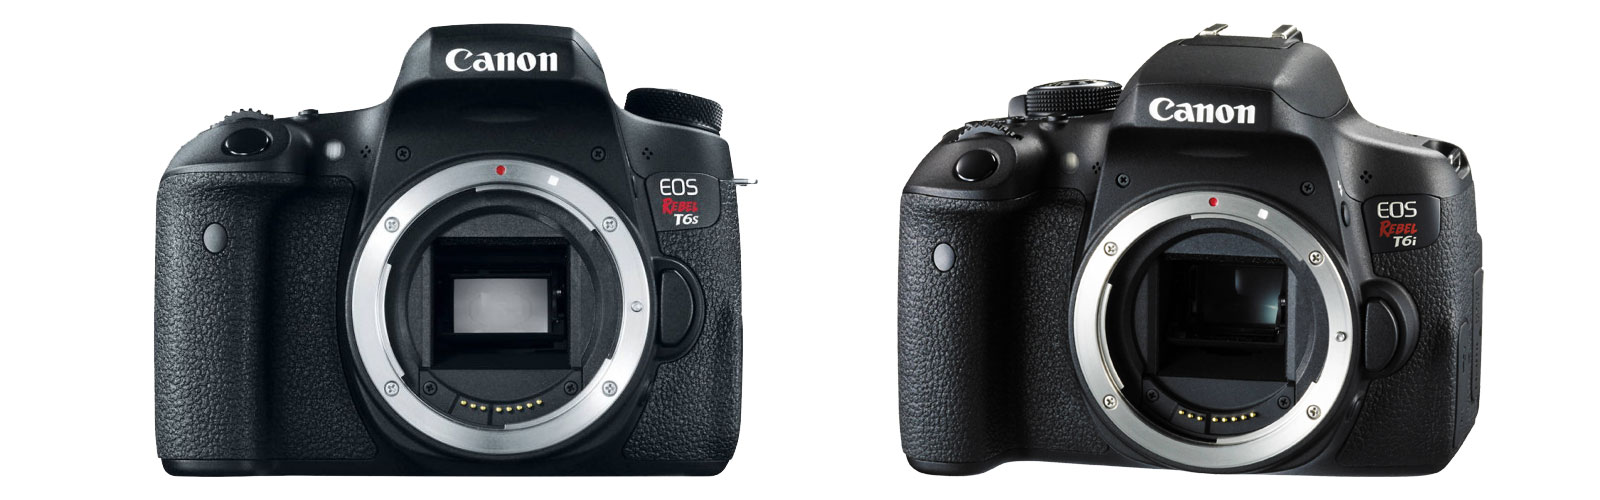 Calmly New Canon Eos Rebels Rebel Rebel Available April 2015 New Canon Eos Rebels Rebel Rebel Available T6s Or T6i T6 Vs T6i Video Quality dpreview T6s Vs T6i